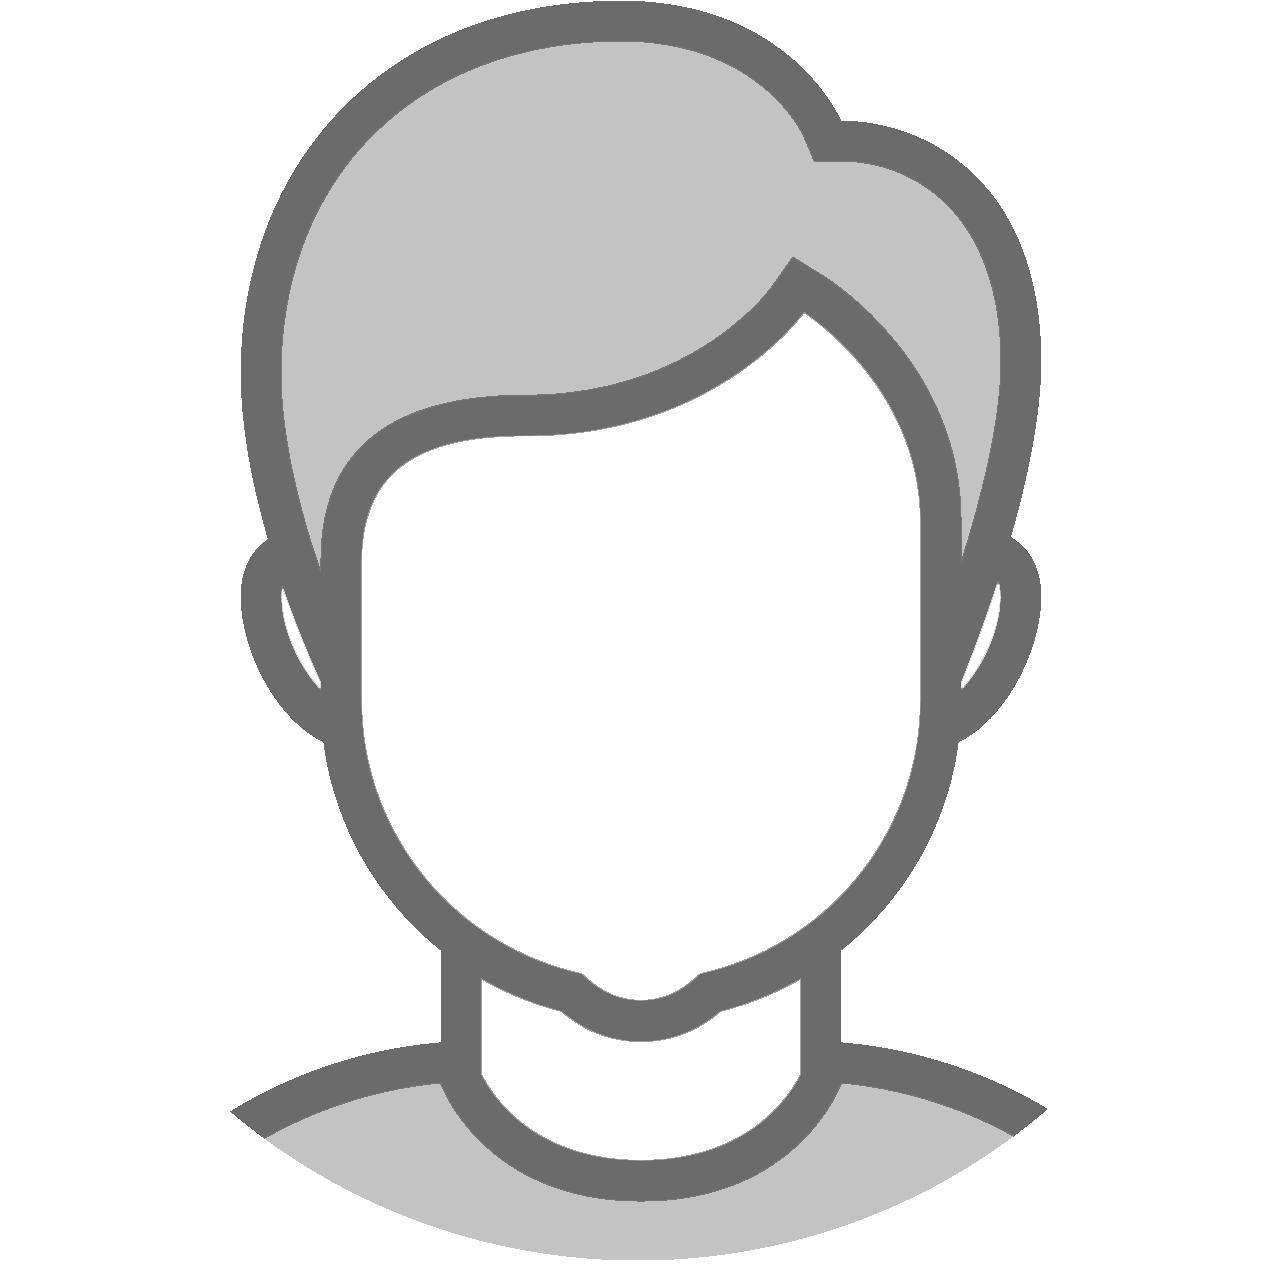 gray icon background round